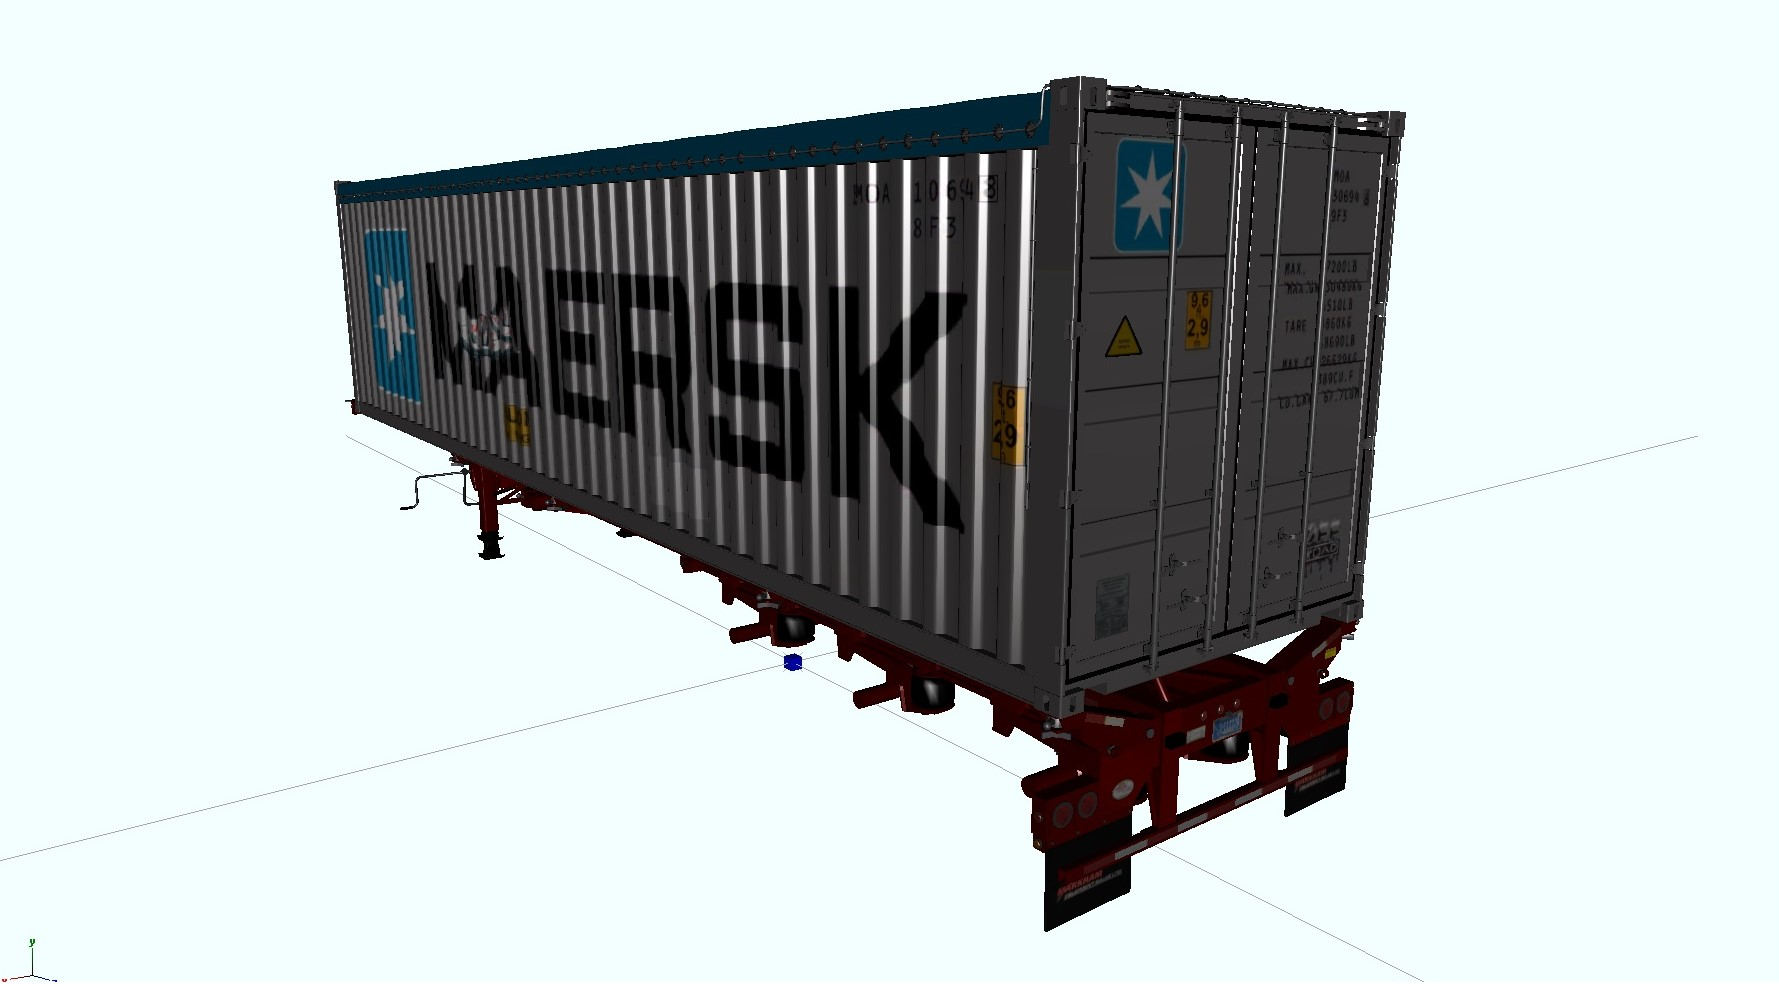 Ceetah Trailer Pack für ATS Jtc5z25z